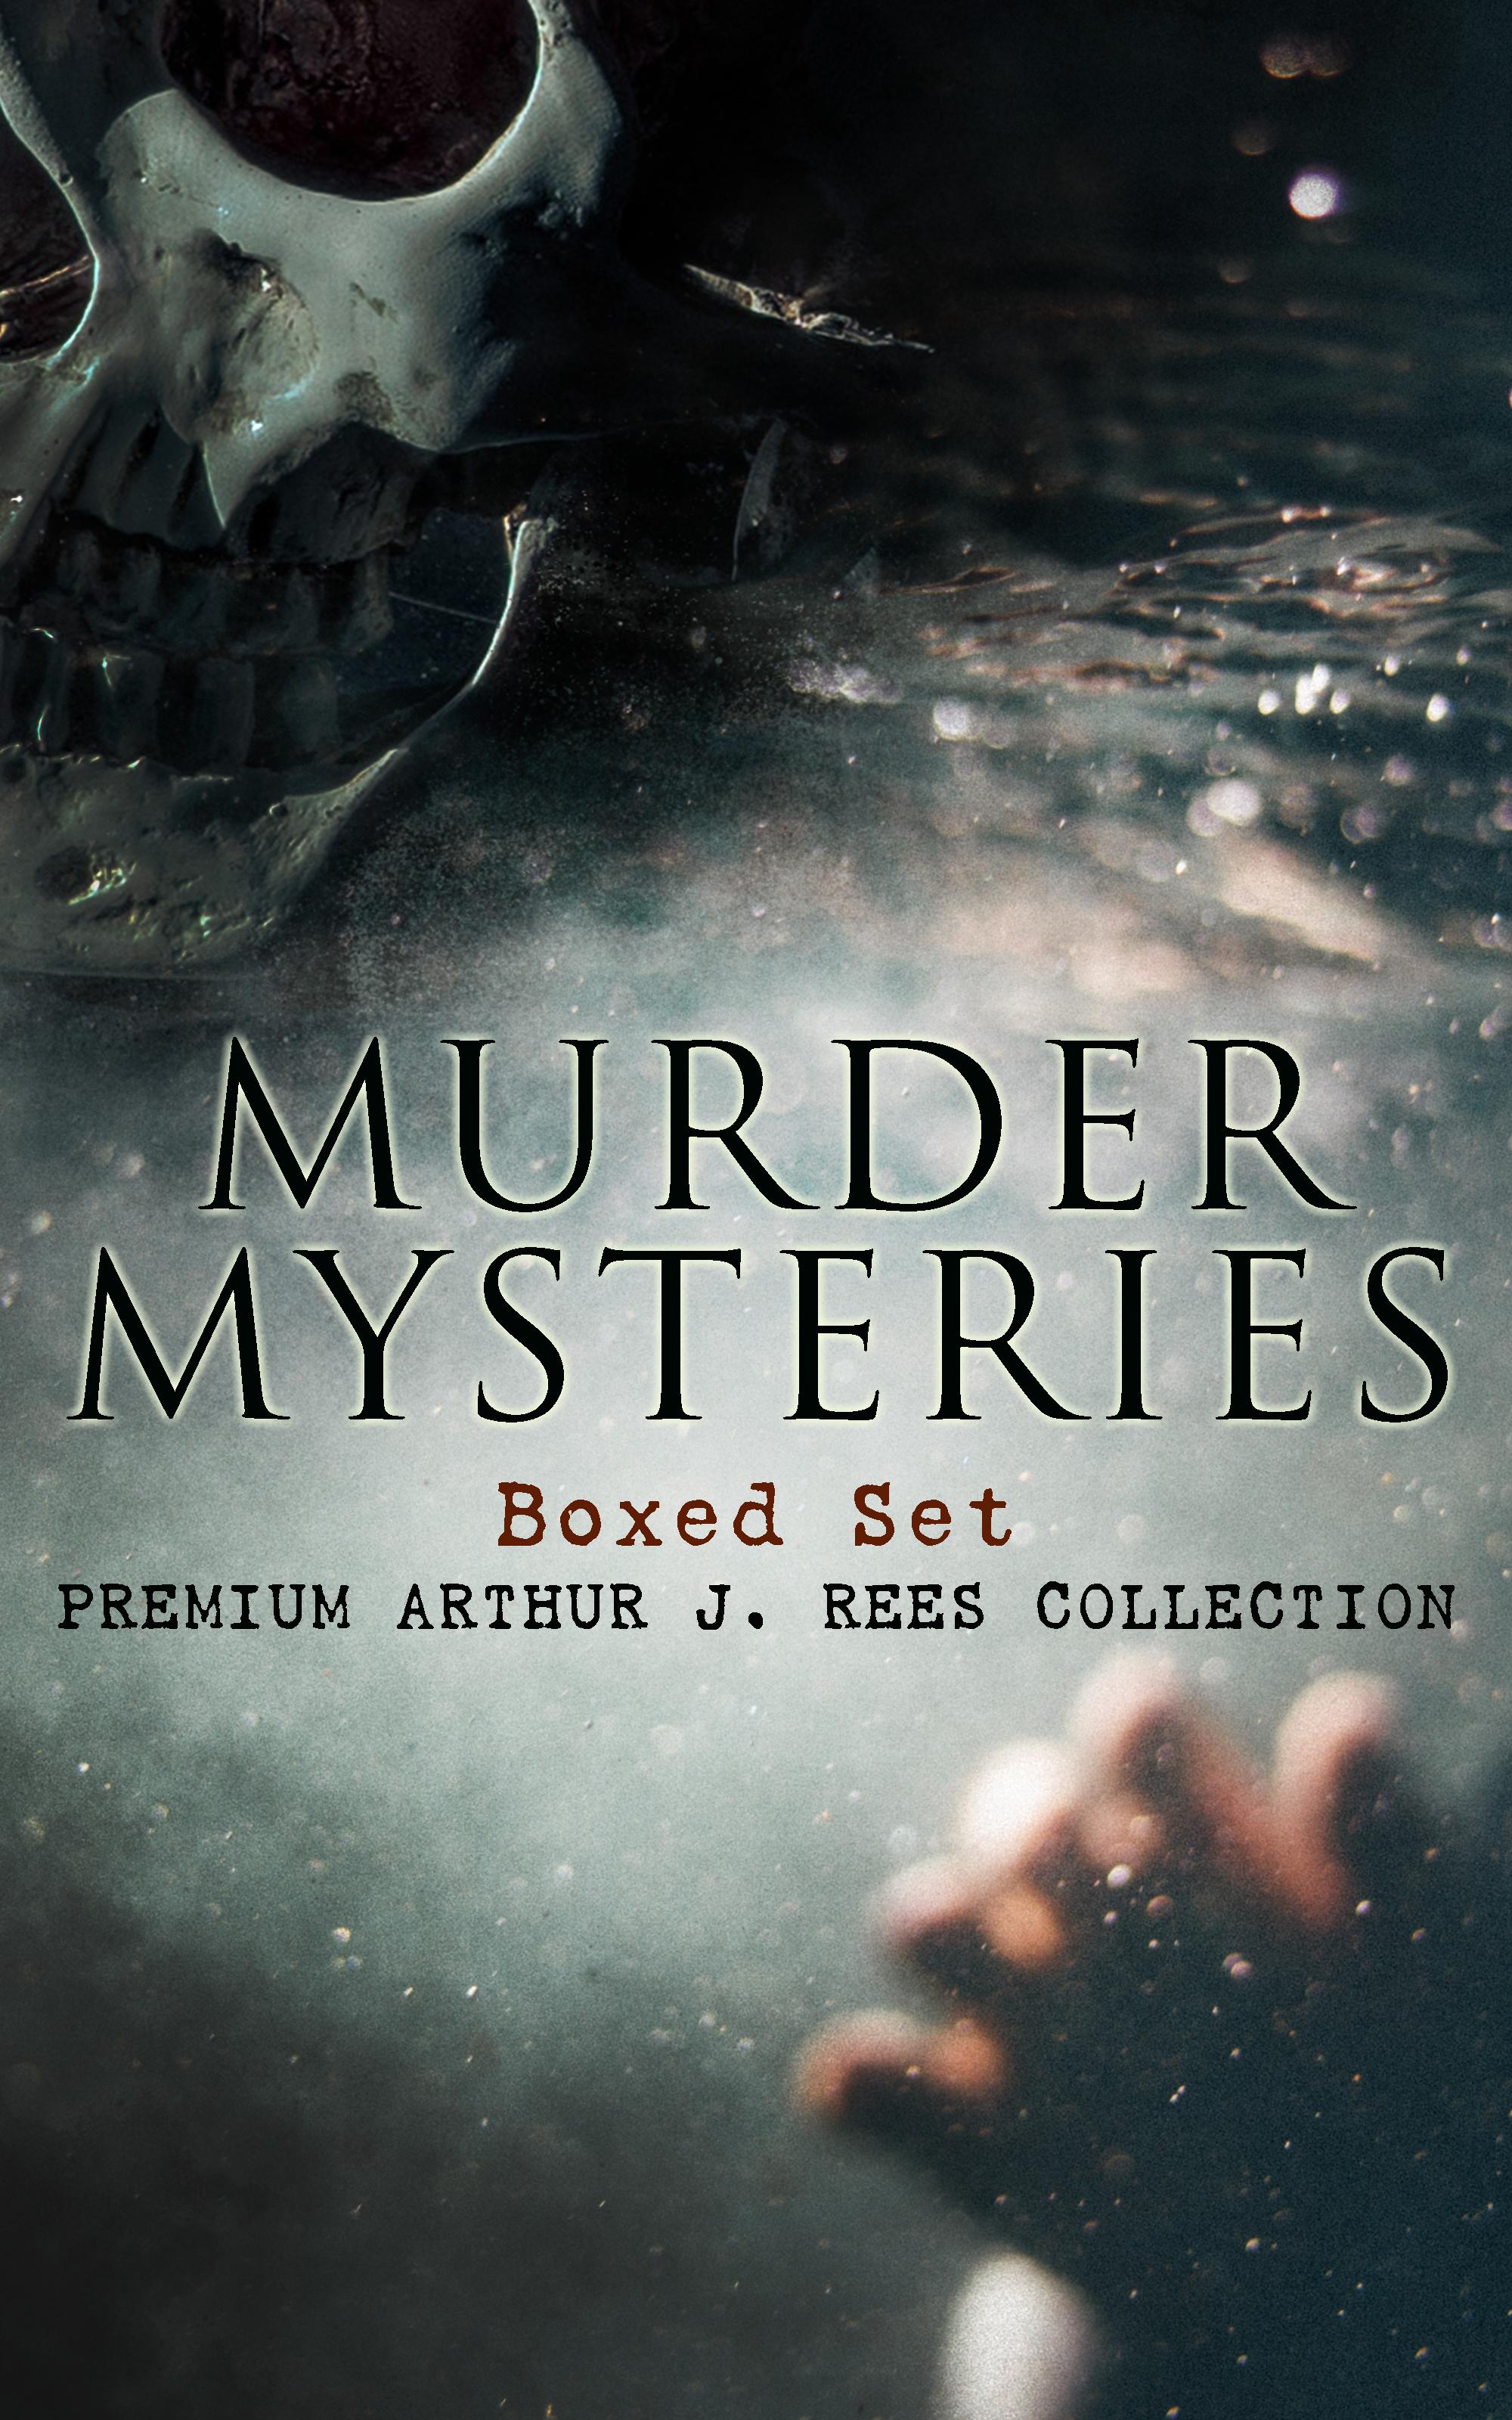 MURDER MYSTERIES Boxed Set: Premium Arthur J. Rees Collection